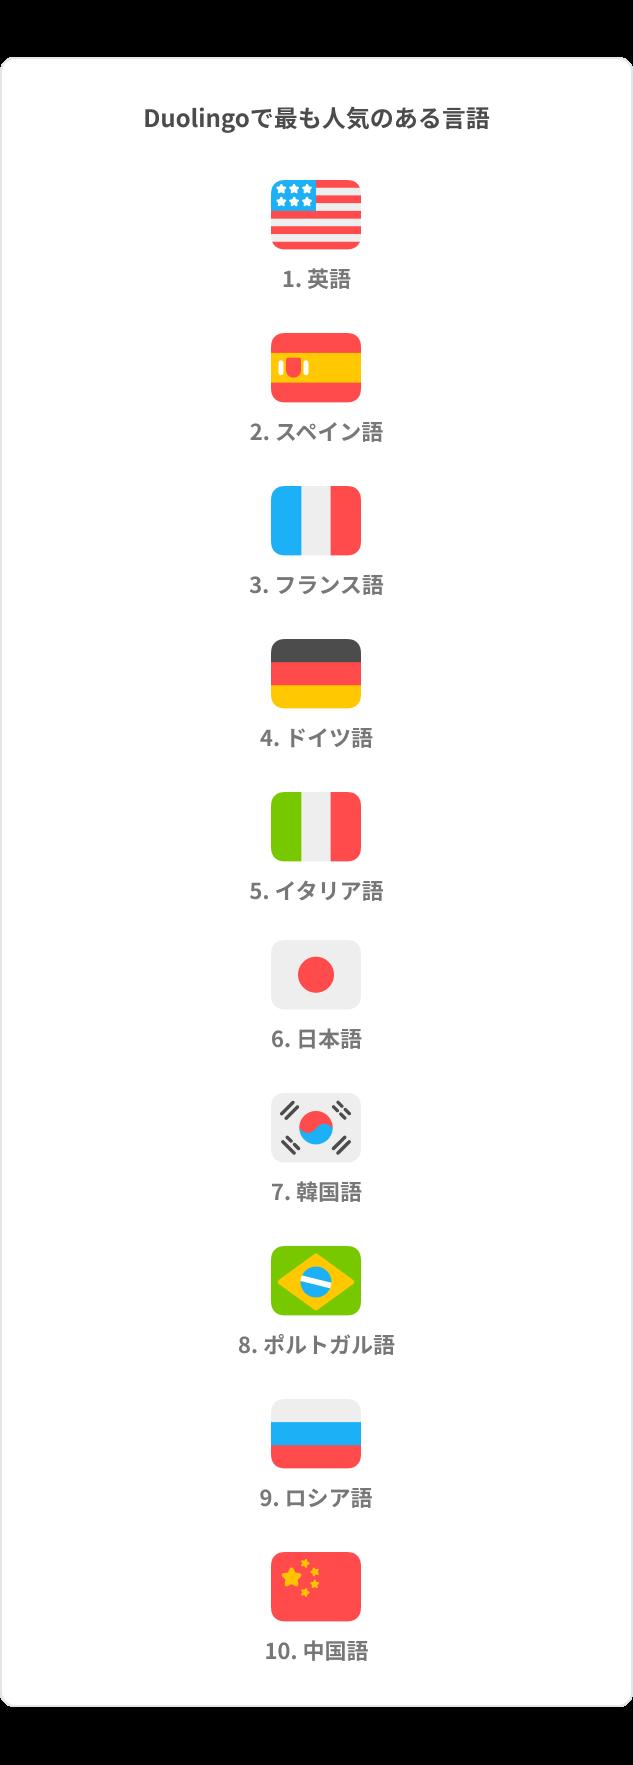 DLR_Japan_Top10_1